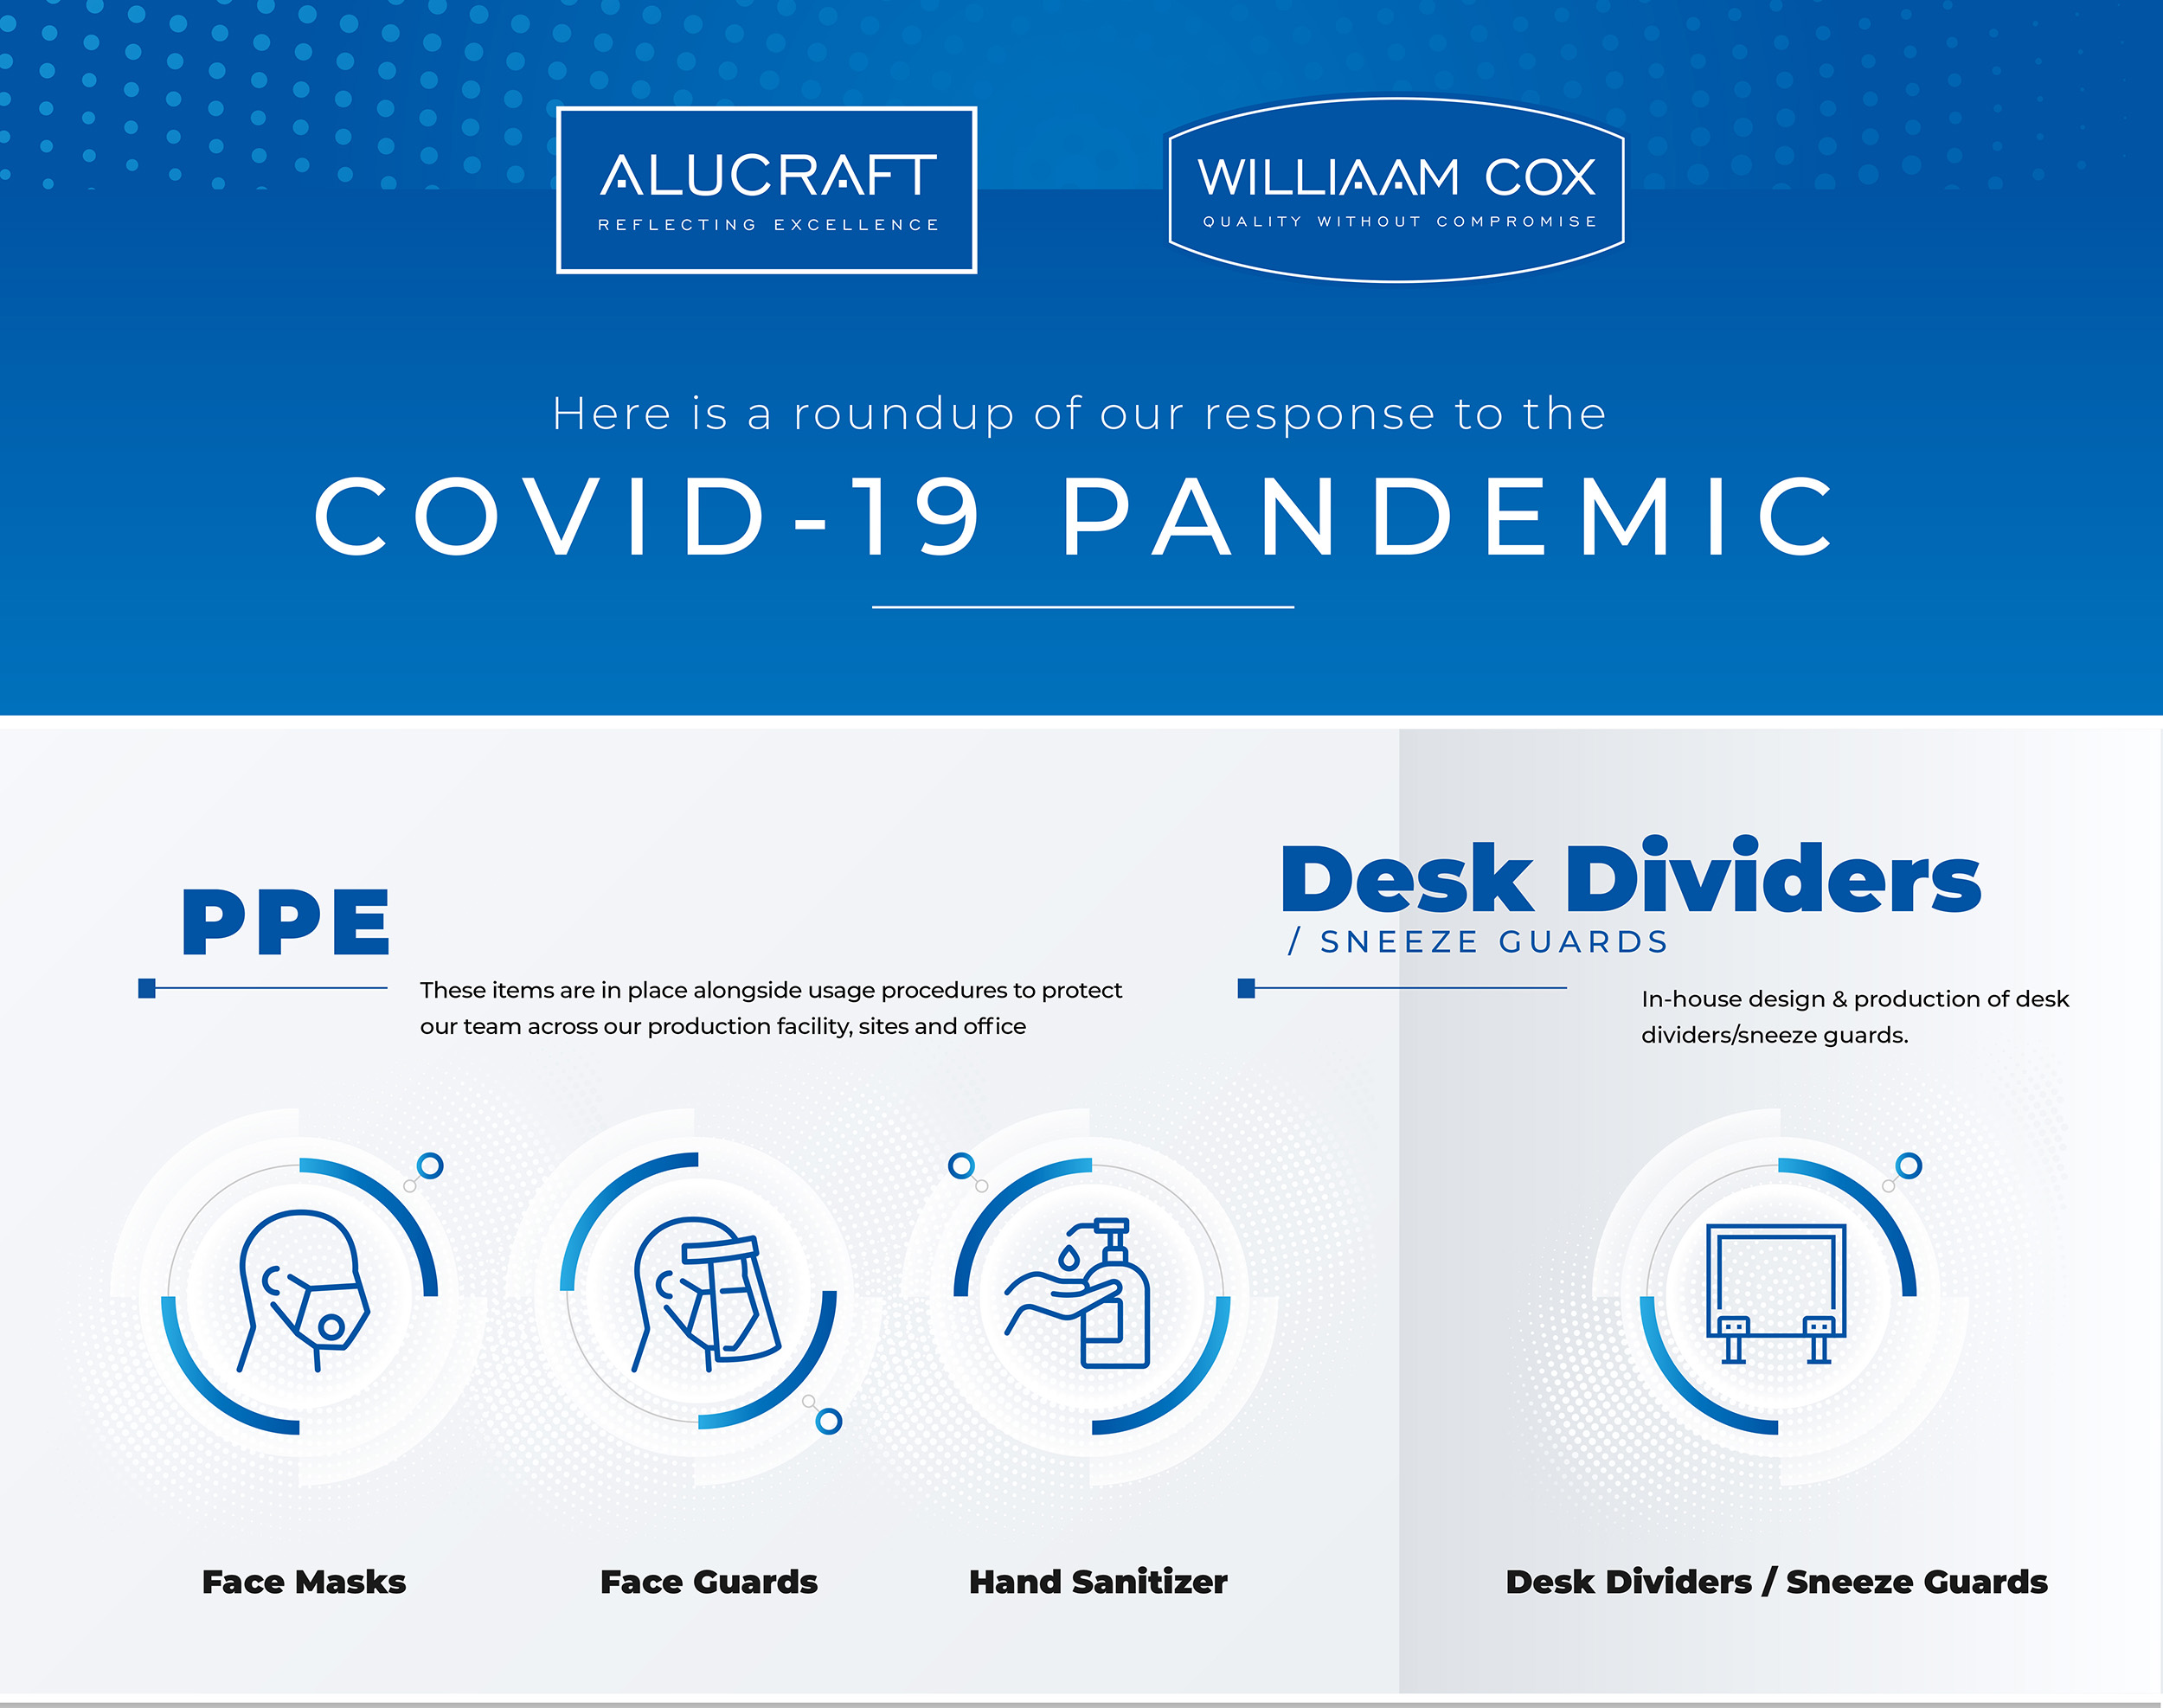 Williaam Cox Covid response graphic